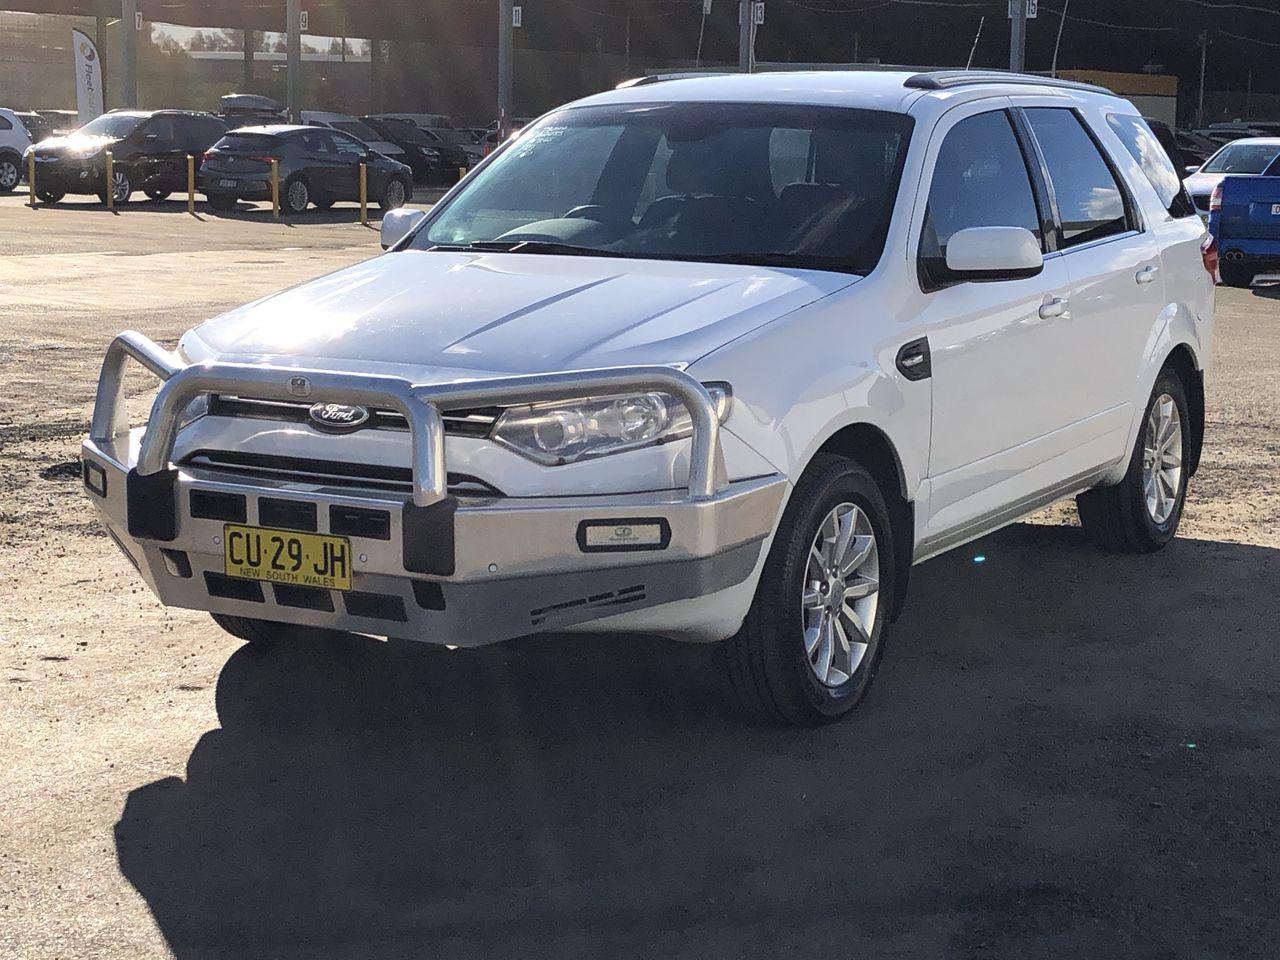 2015 Ford Territory TX (RWD) SZ II Turbo Diesel Automatic Wagon